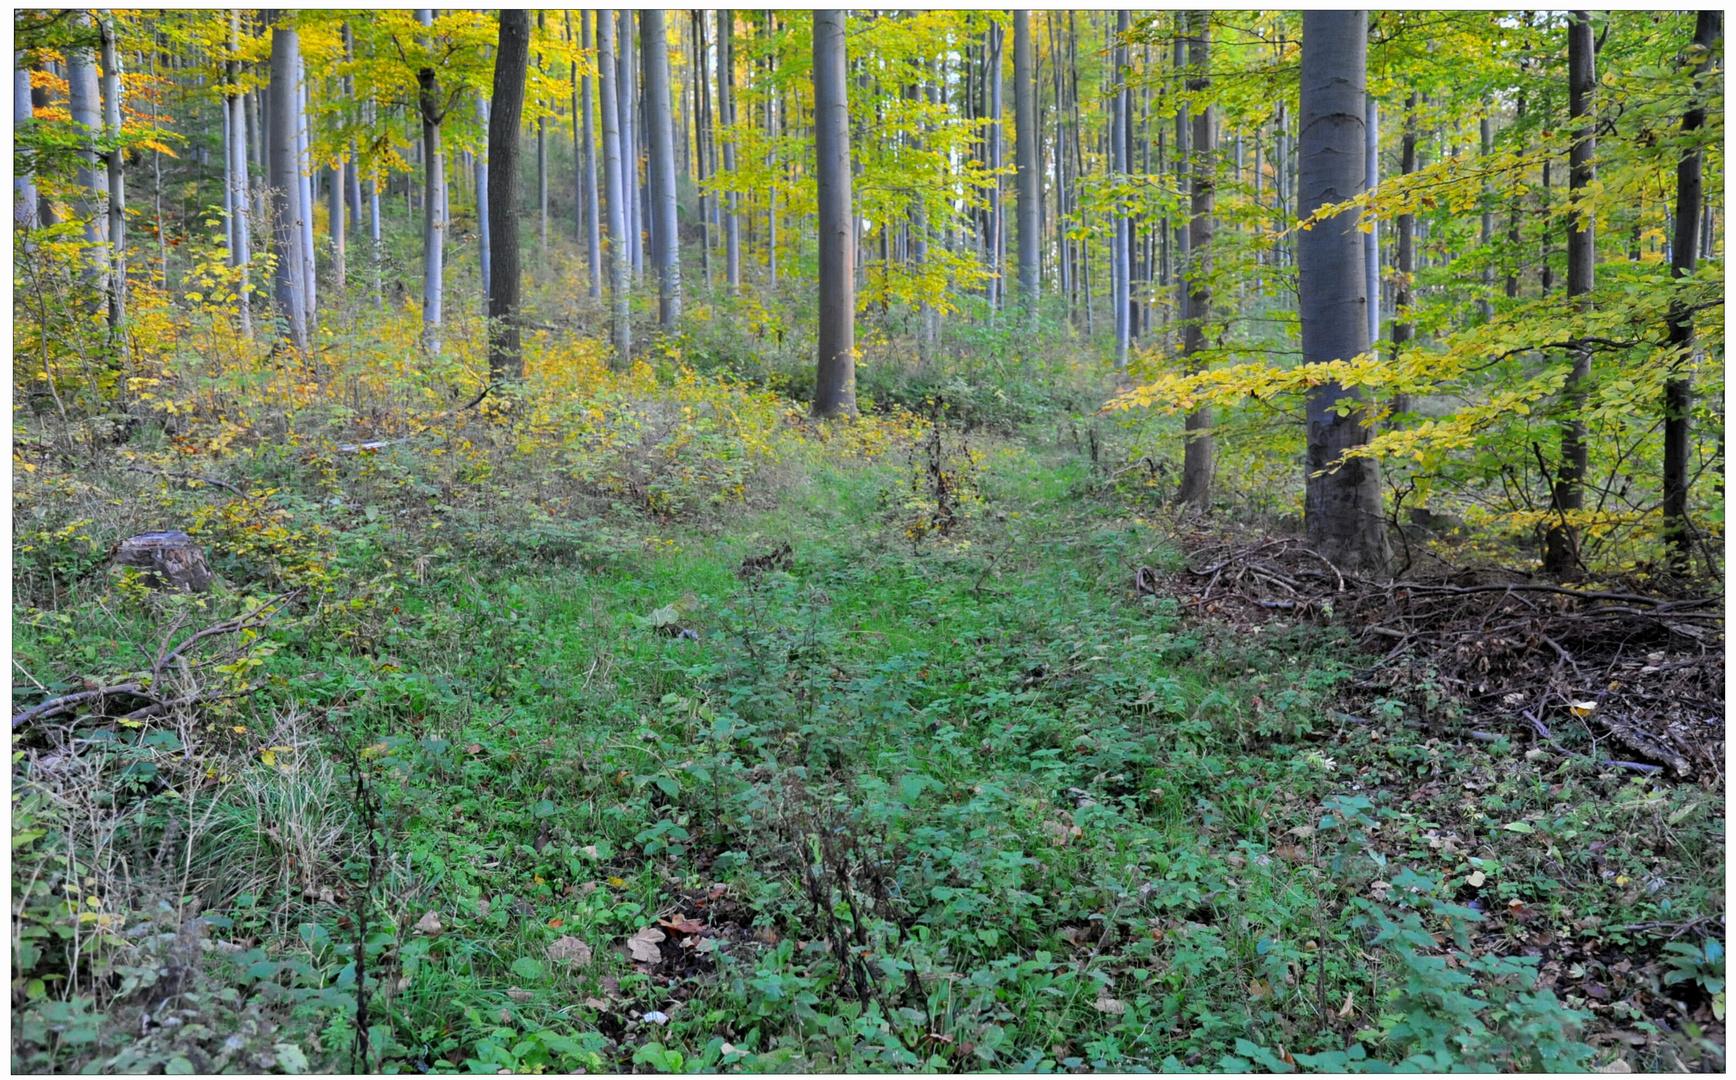 Bosque en otoño V (Wald im Herbst V)